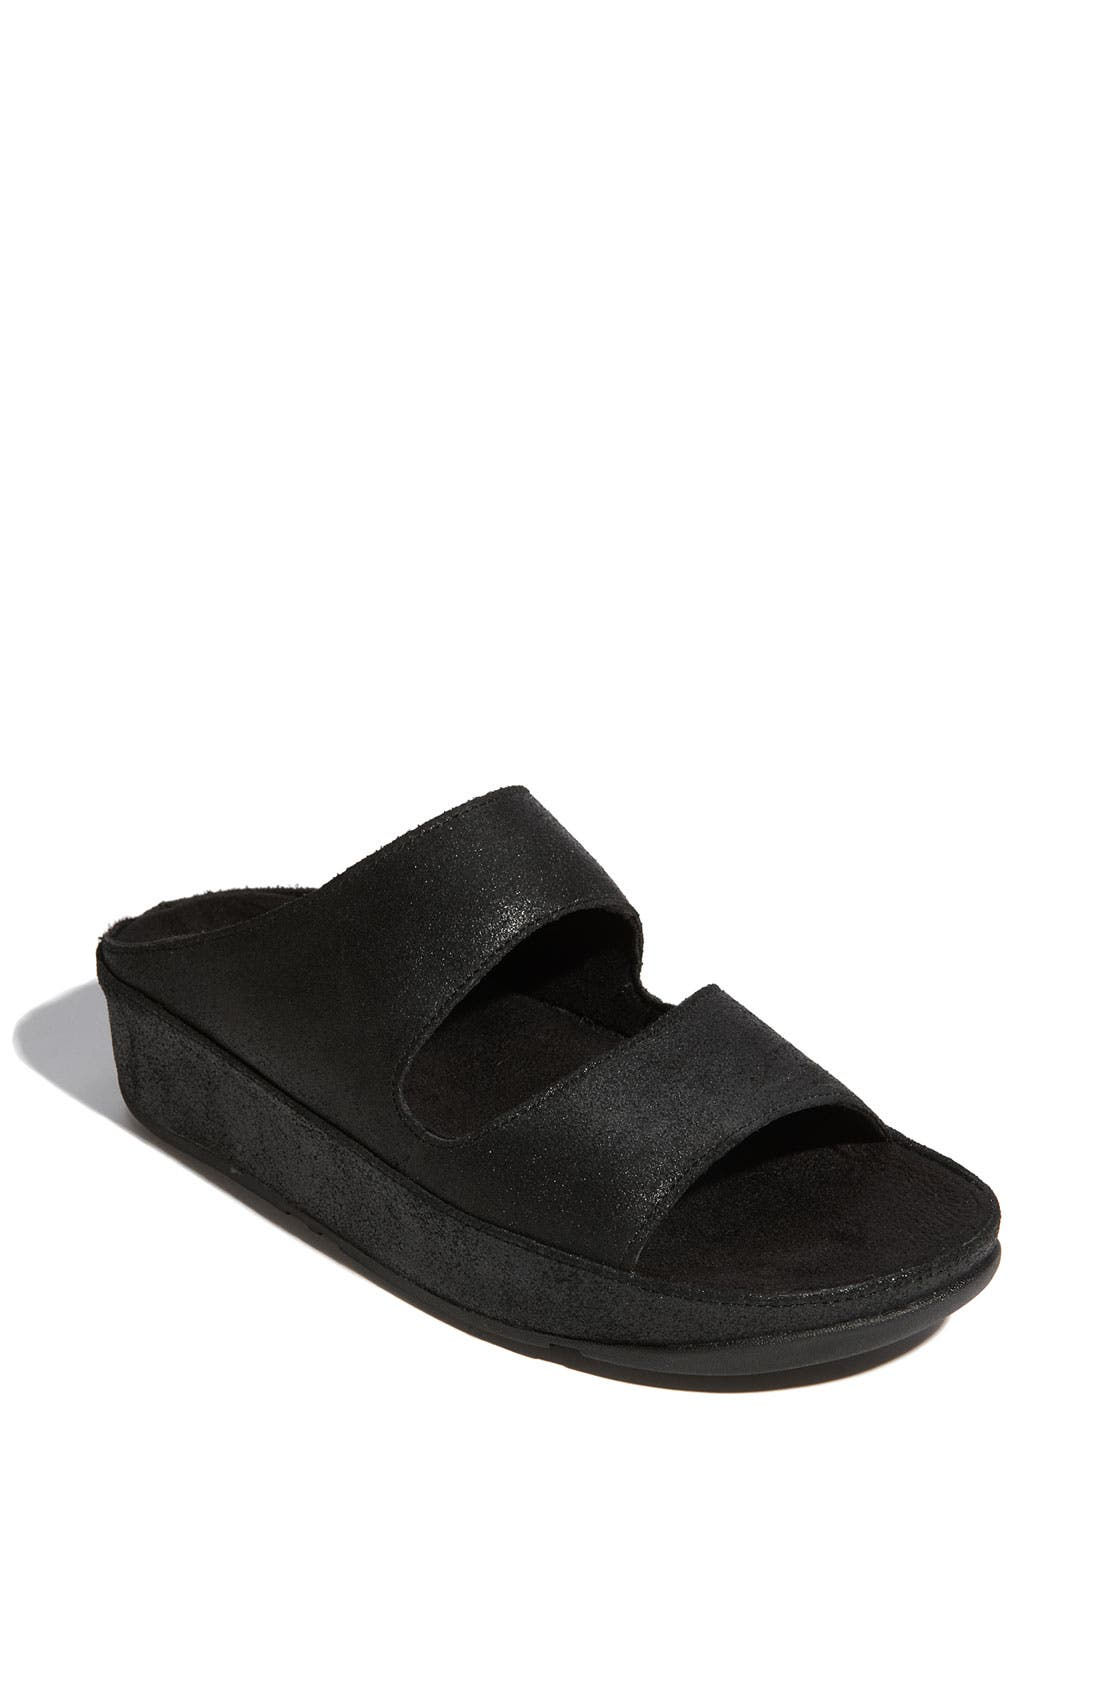 Alternate Image 1 Selected - FitFlop 'Lolla Crackle' Sandal